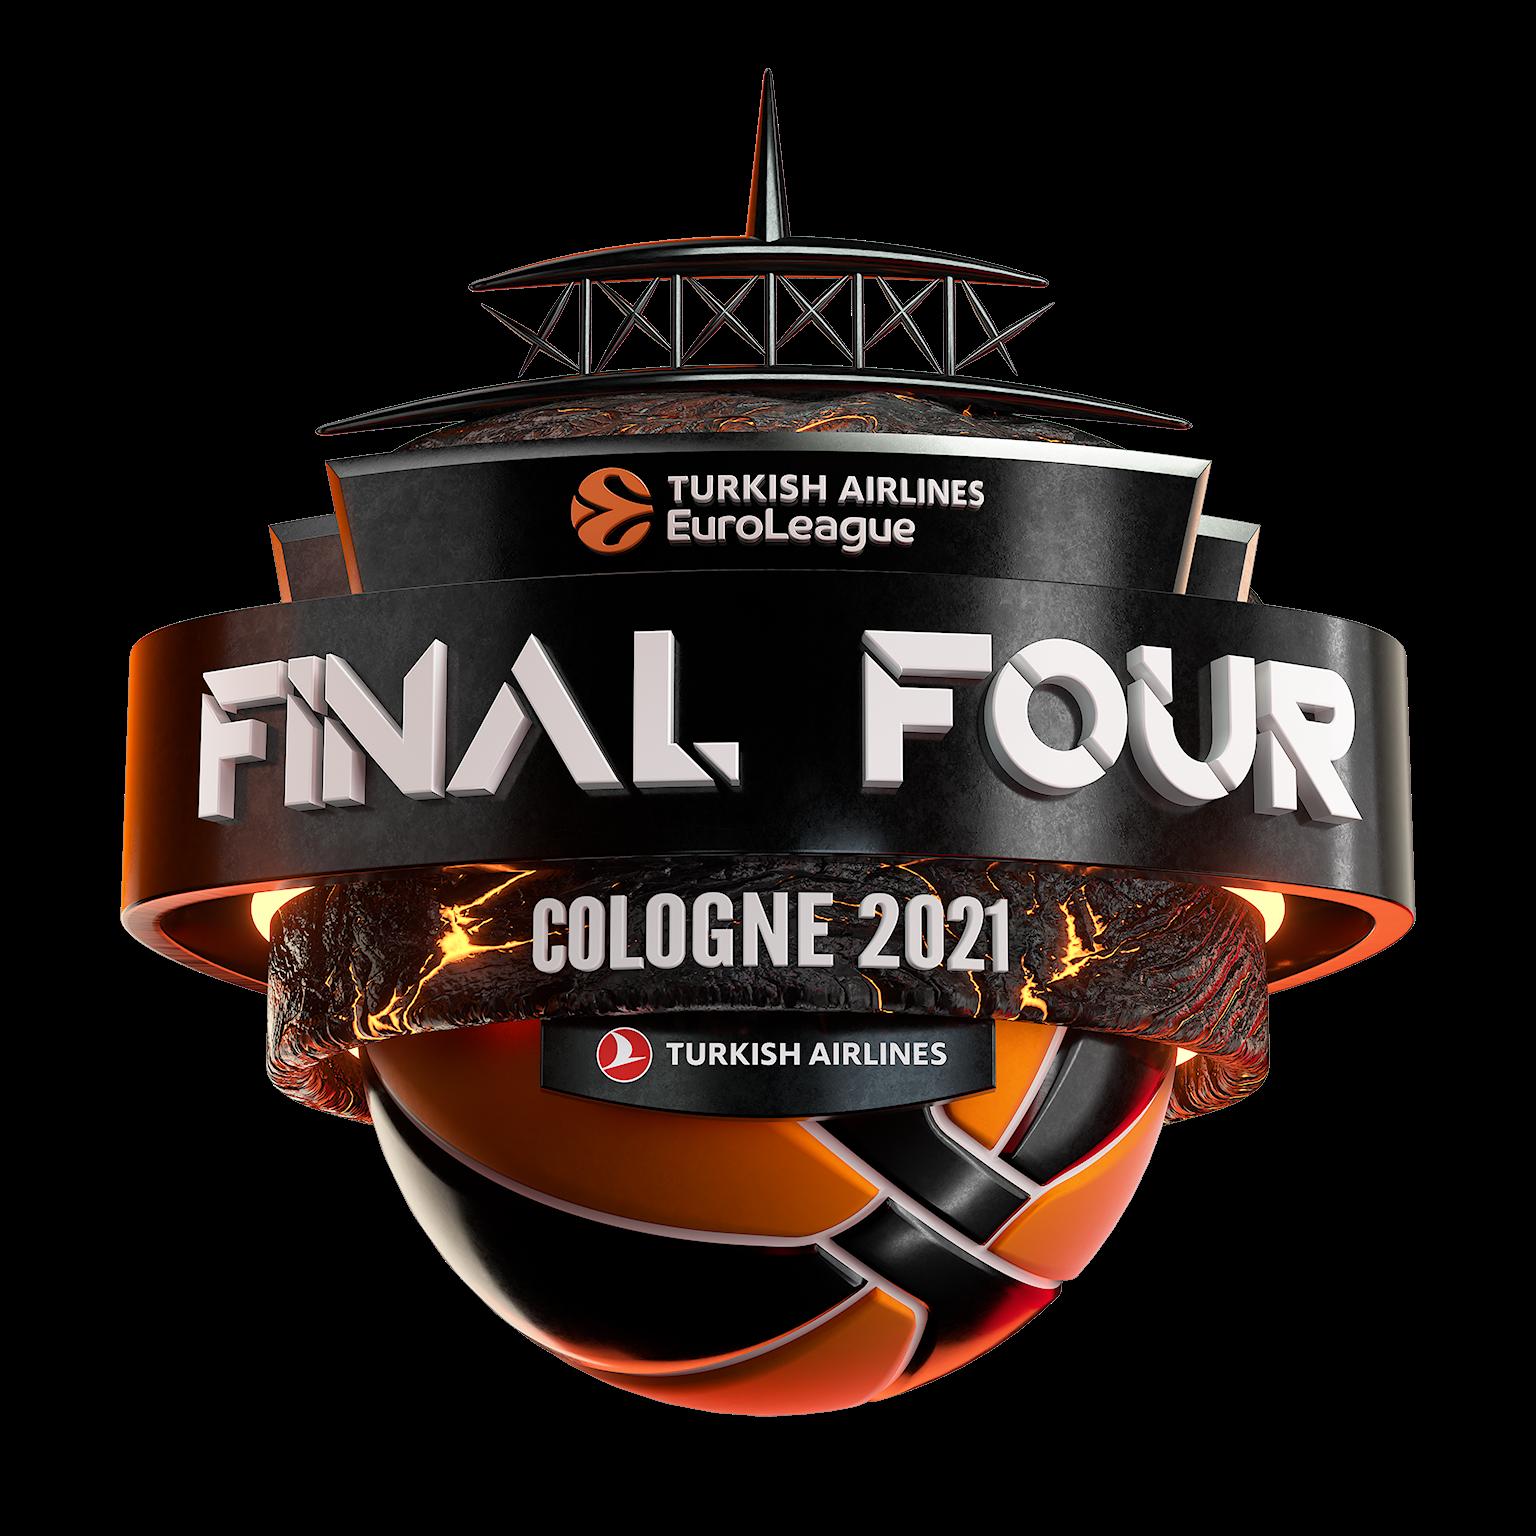 2021-EuroLeague-Final-Four.png